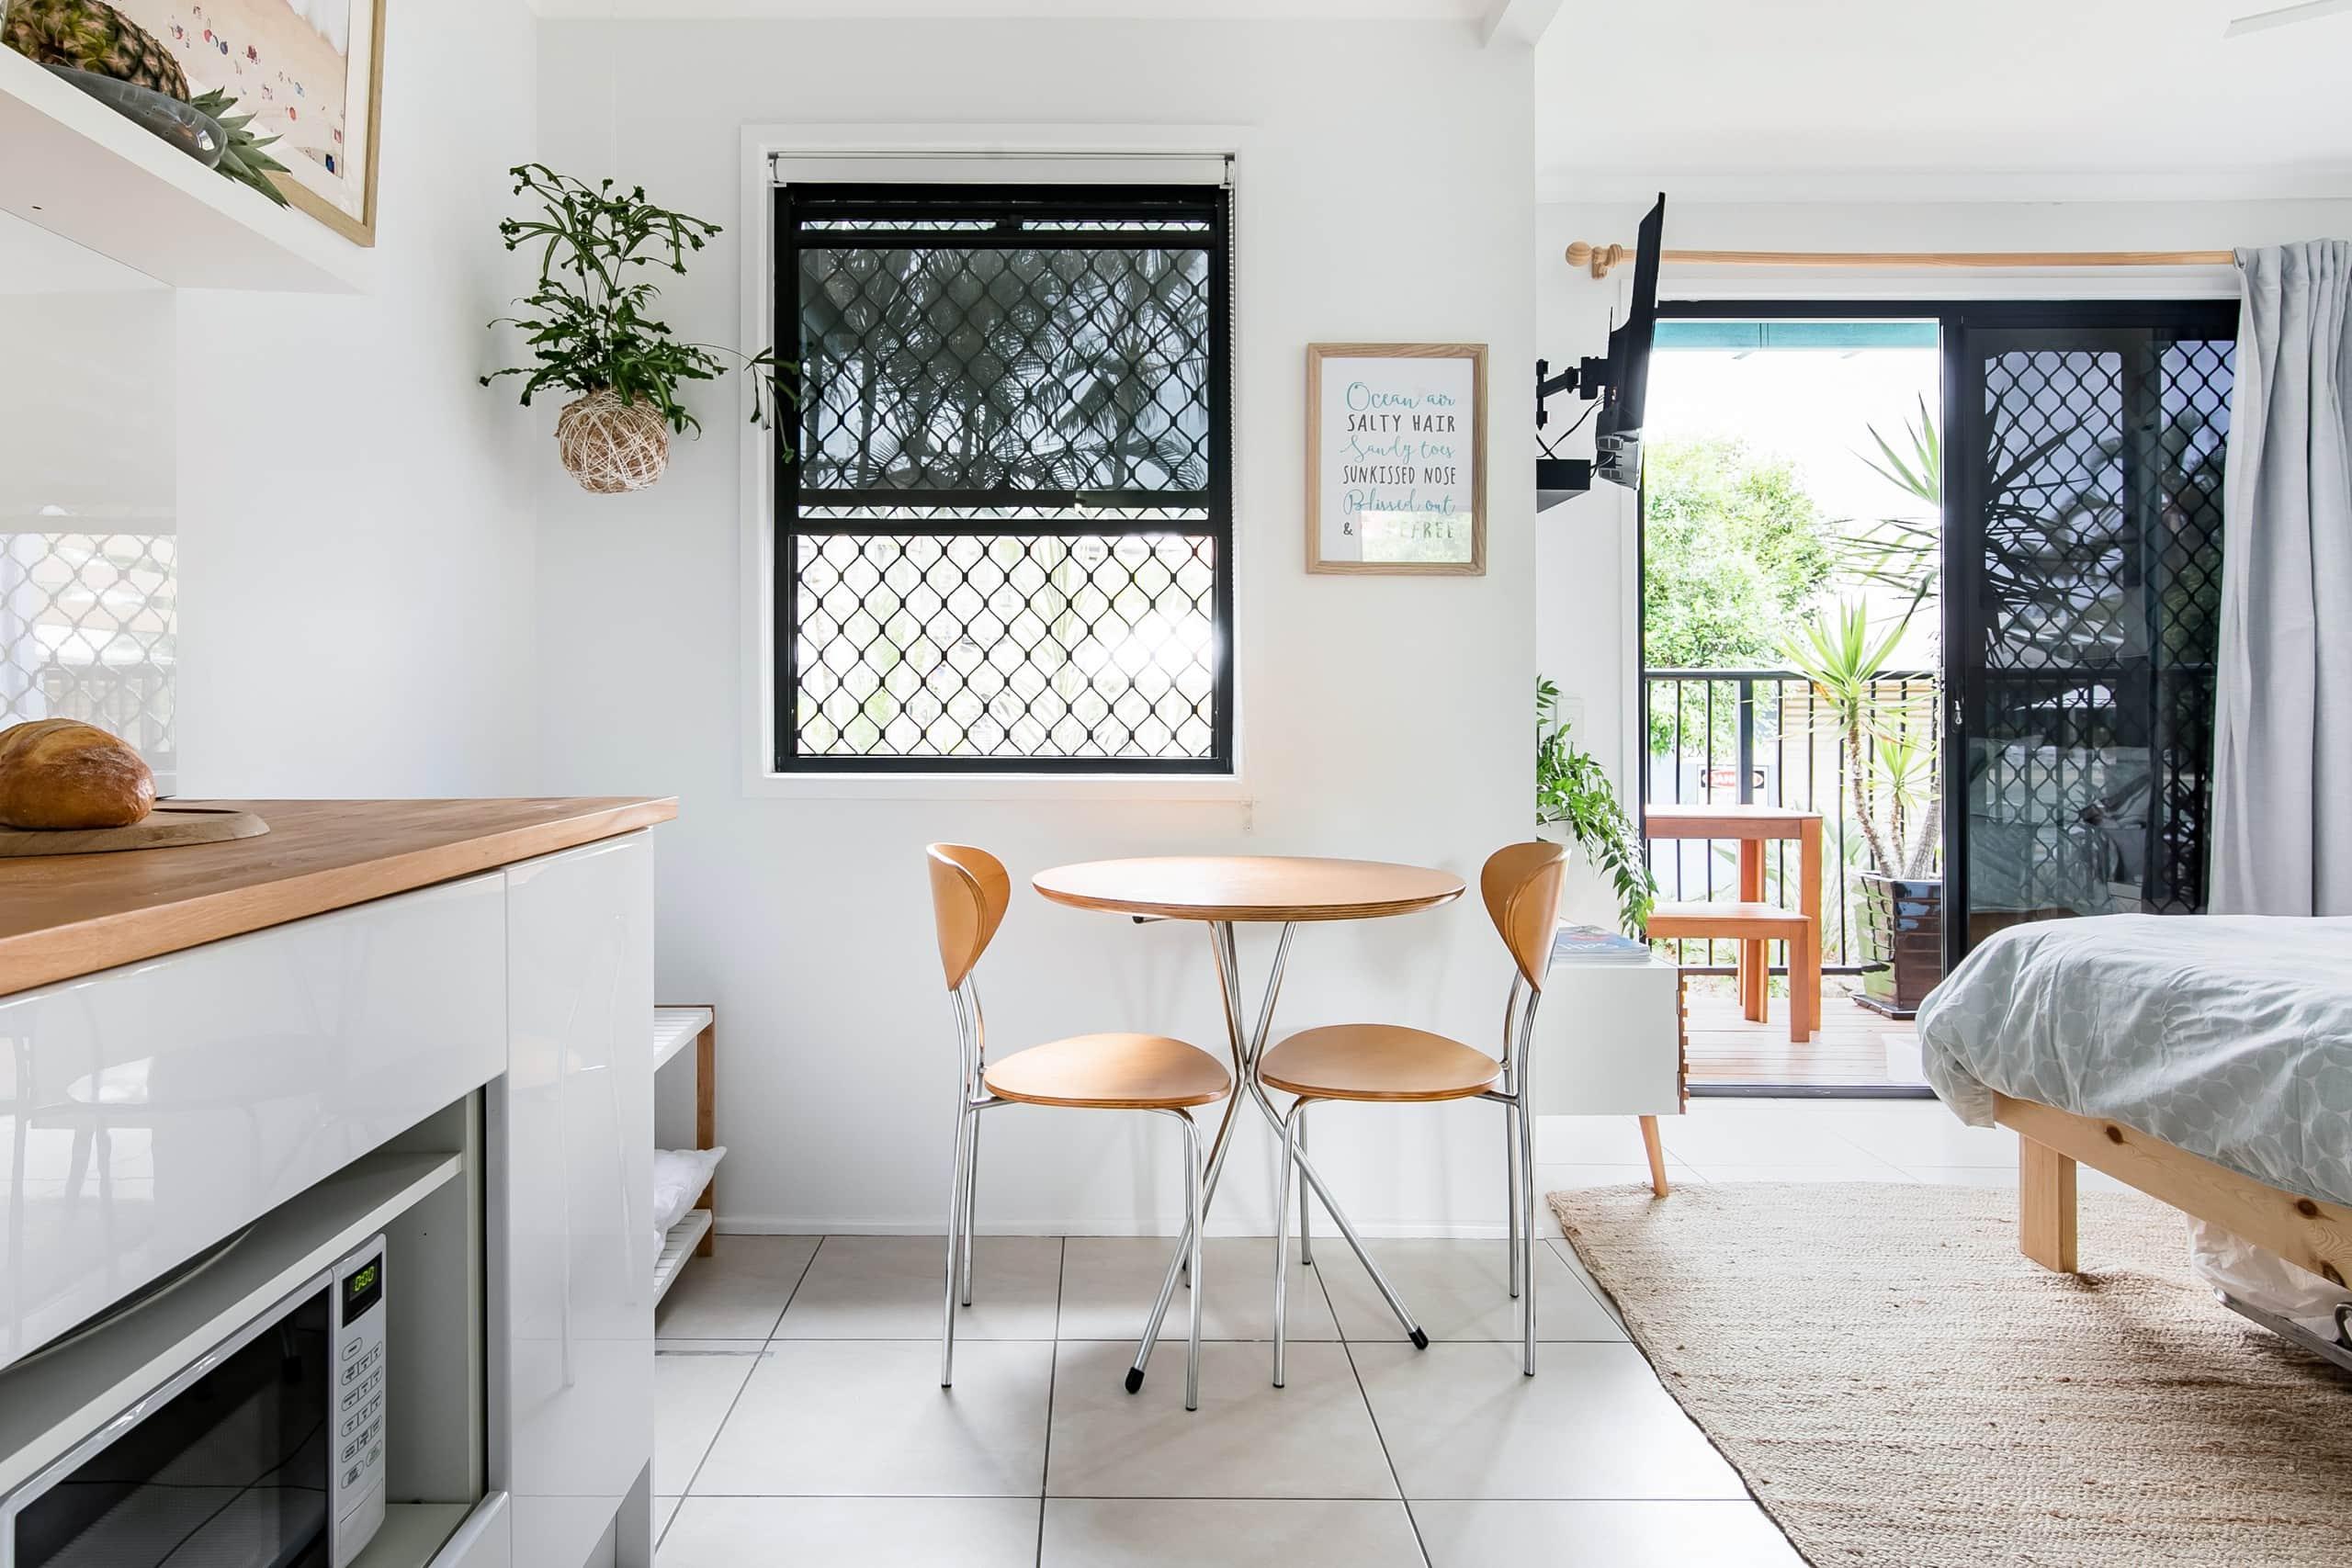 Cozy Coastal Style Studio - Apartments for Rent in ...